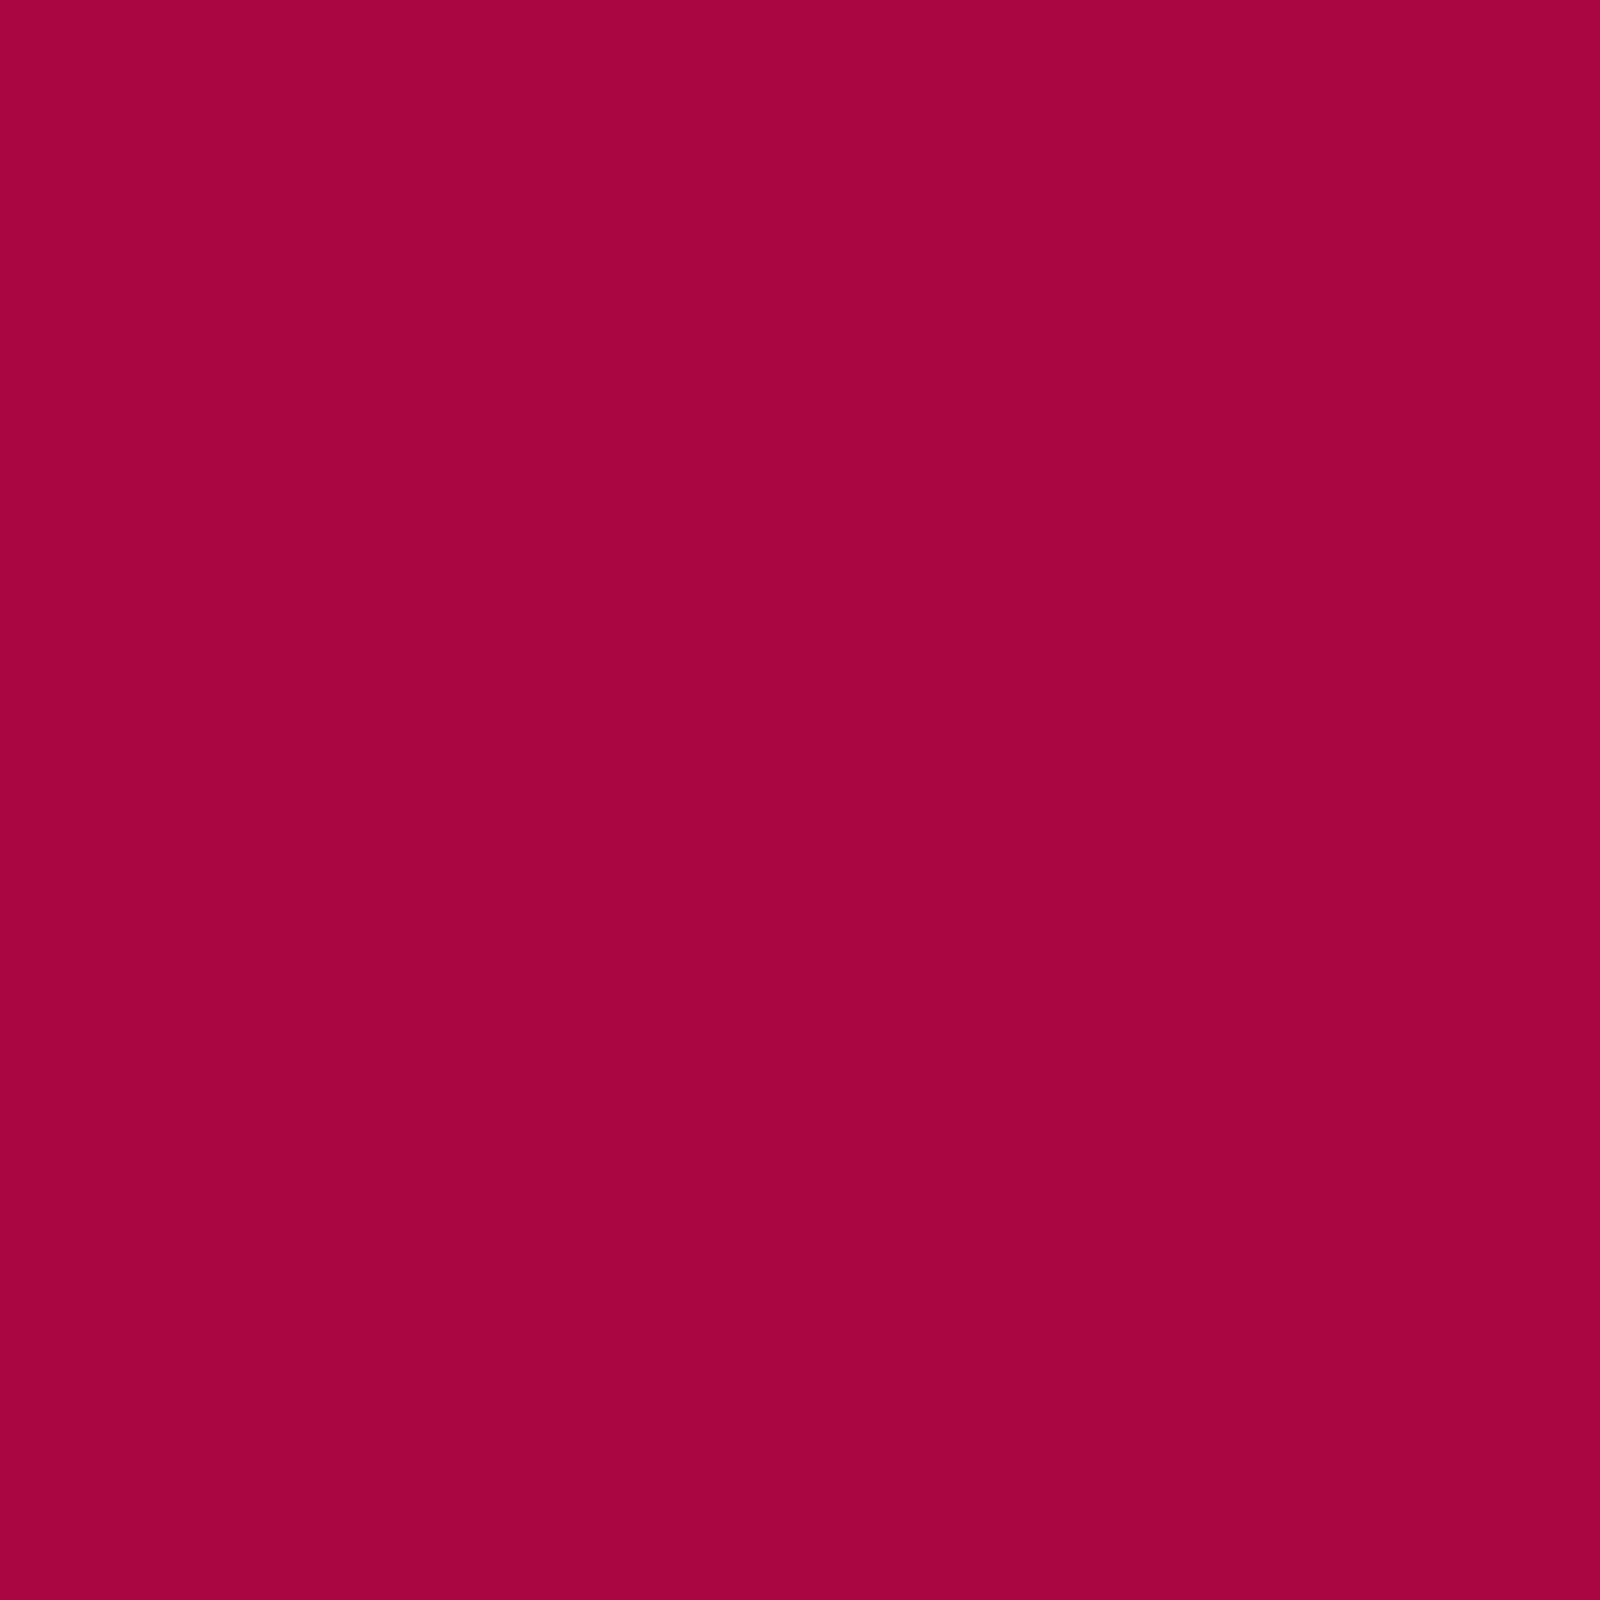 kobra rosu caramiziu